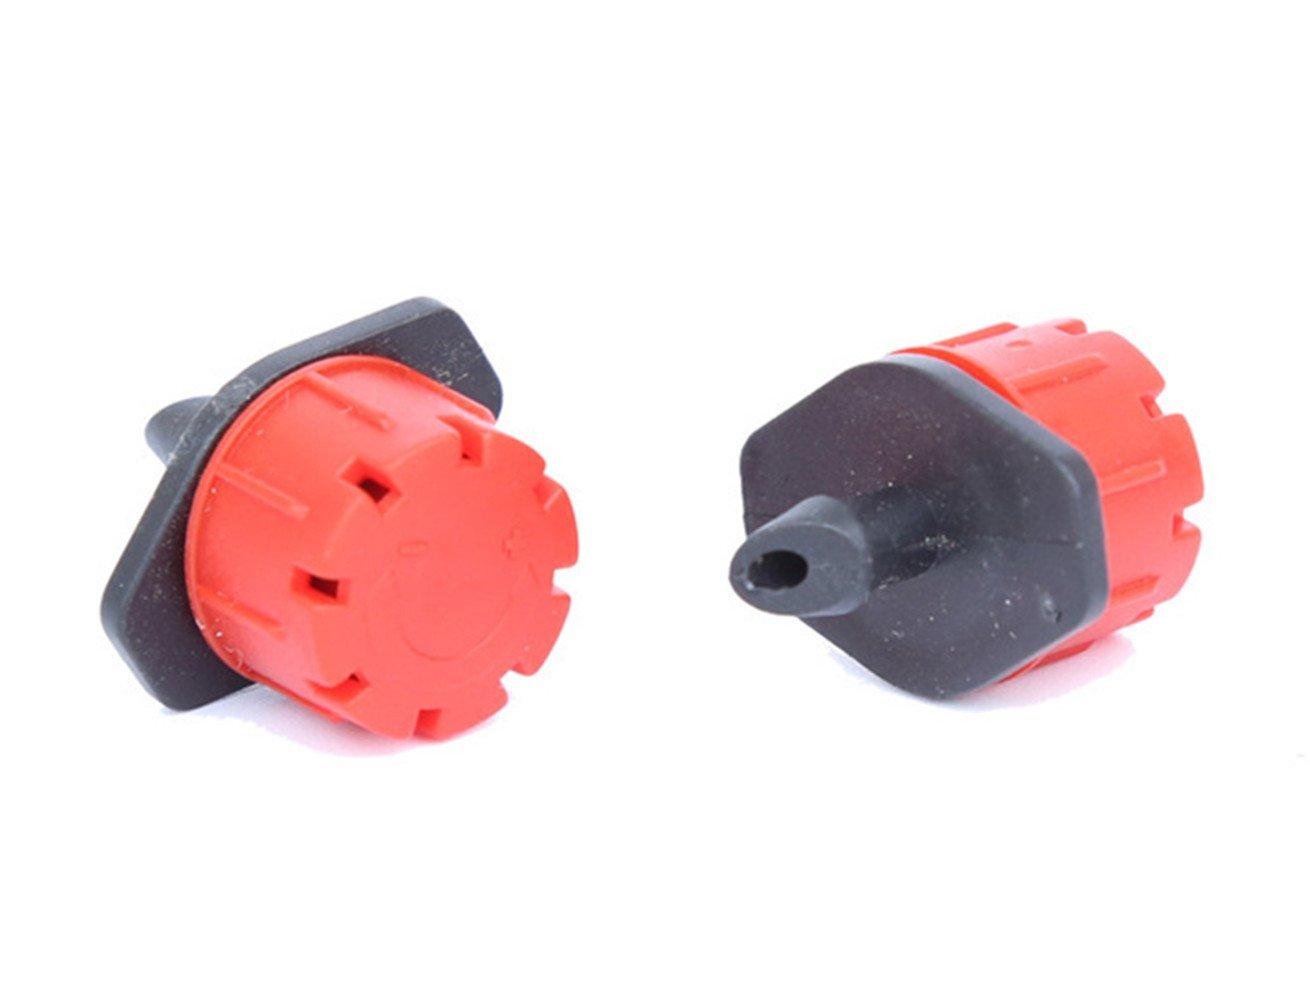 homeyuser 50pcs Micro Flow Dripper Drip Head Adjustable Garden Irrigation Misting 1/4'' Hose Sprinkler Watering Dripper Drip System